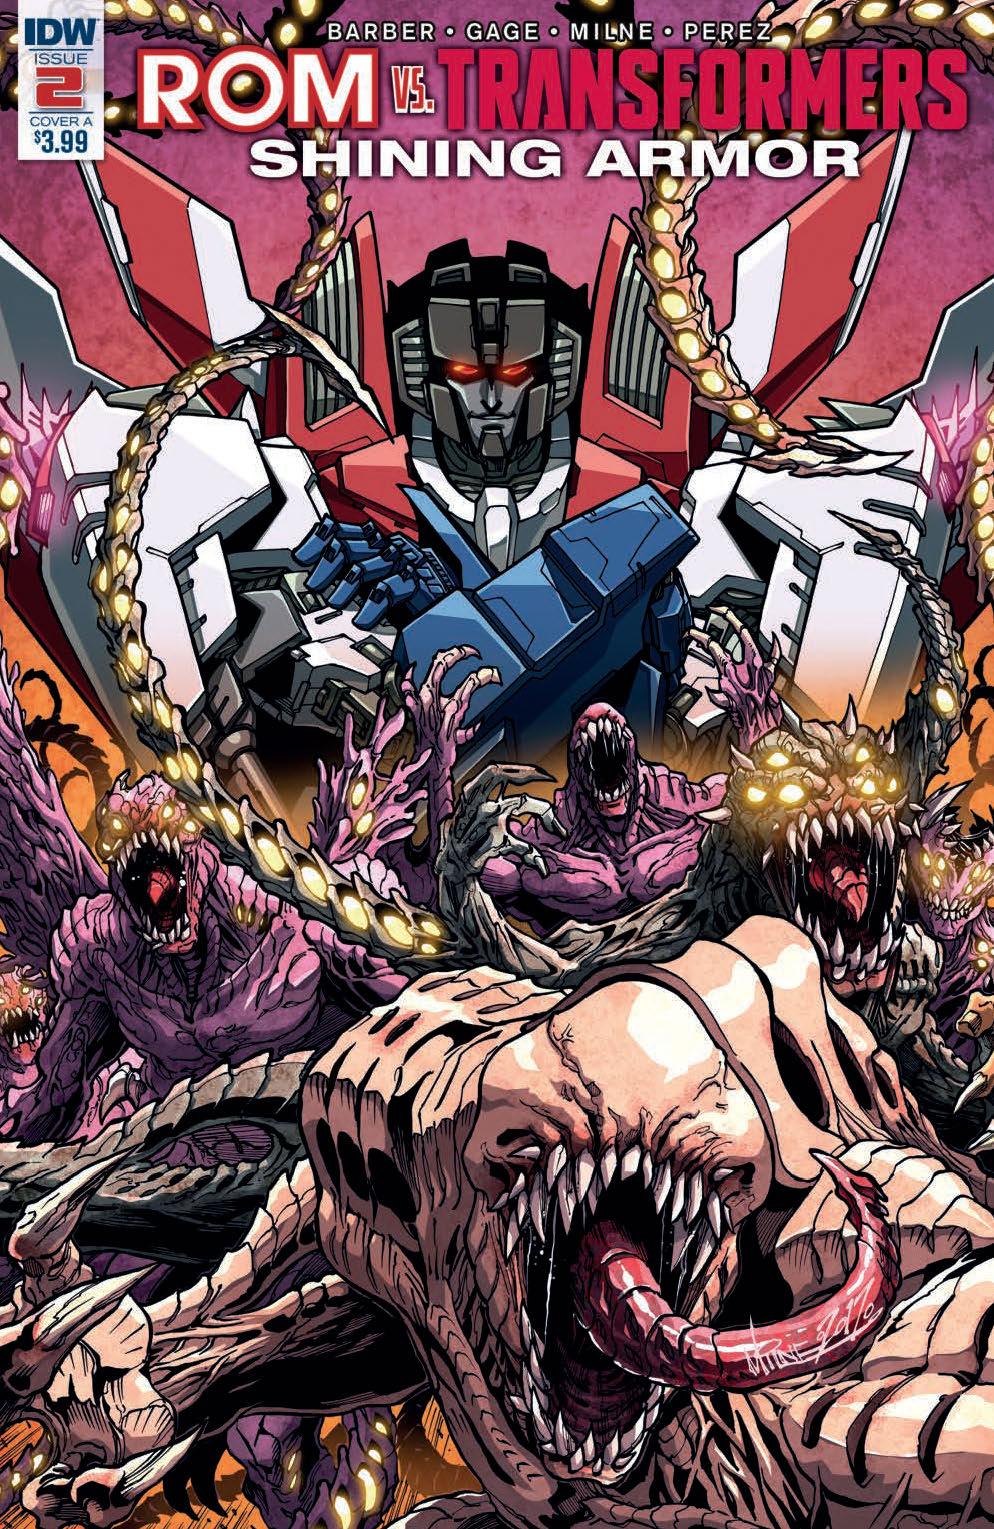 Rom Vs. Transformers: Shining Armor #2 (of 5)